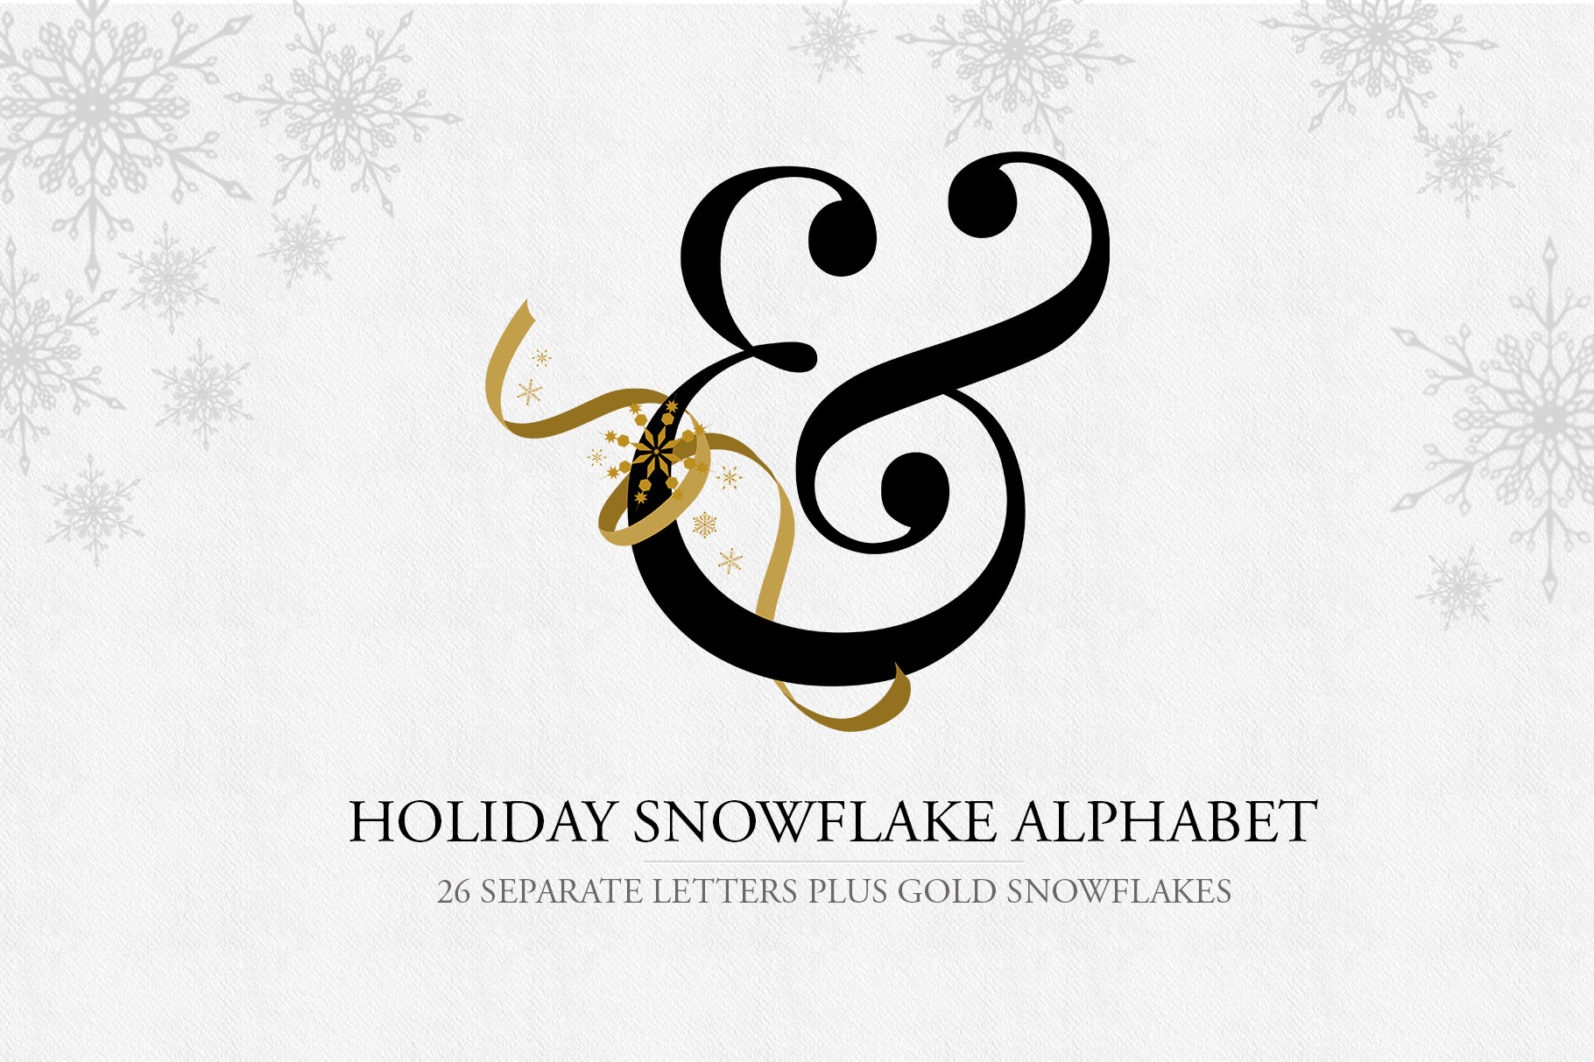 Snowflake Alphabet Letters - snowflake alphabet title -